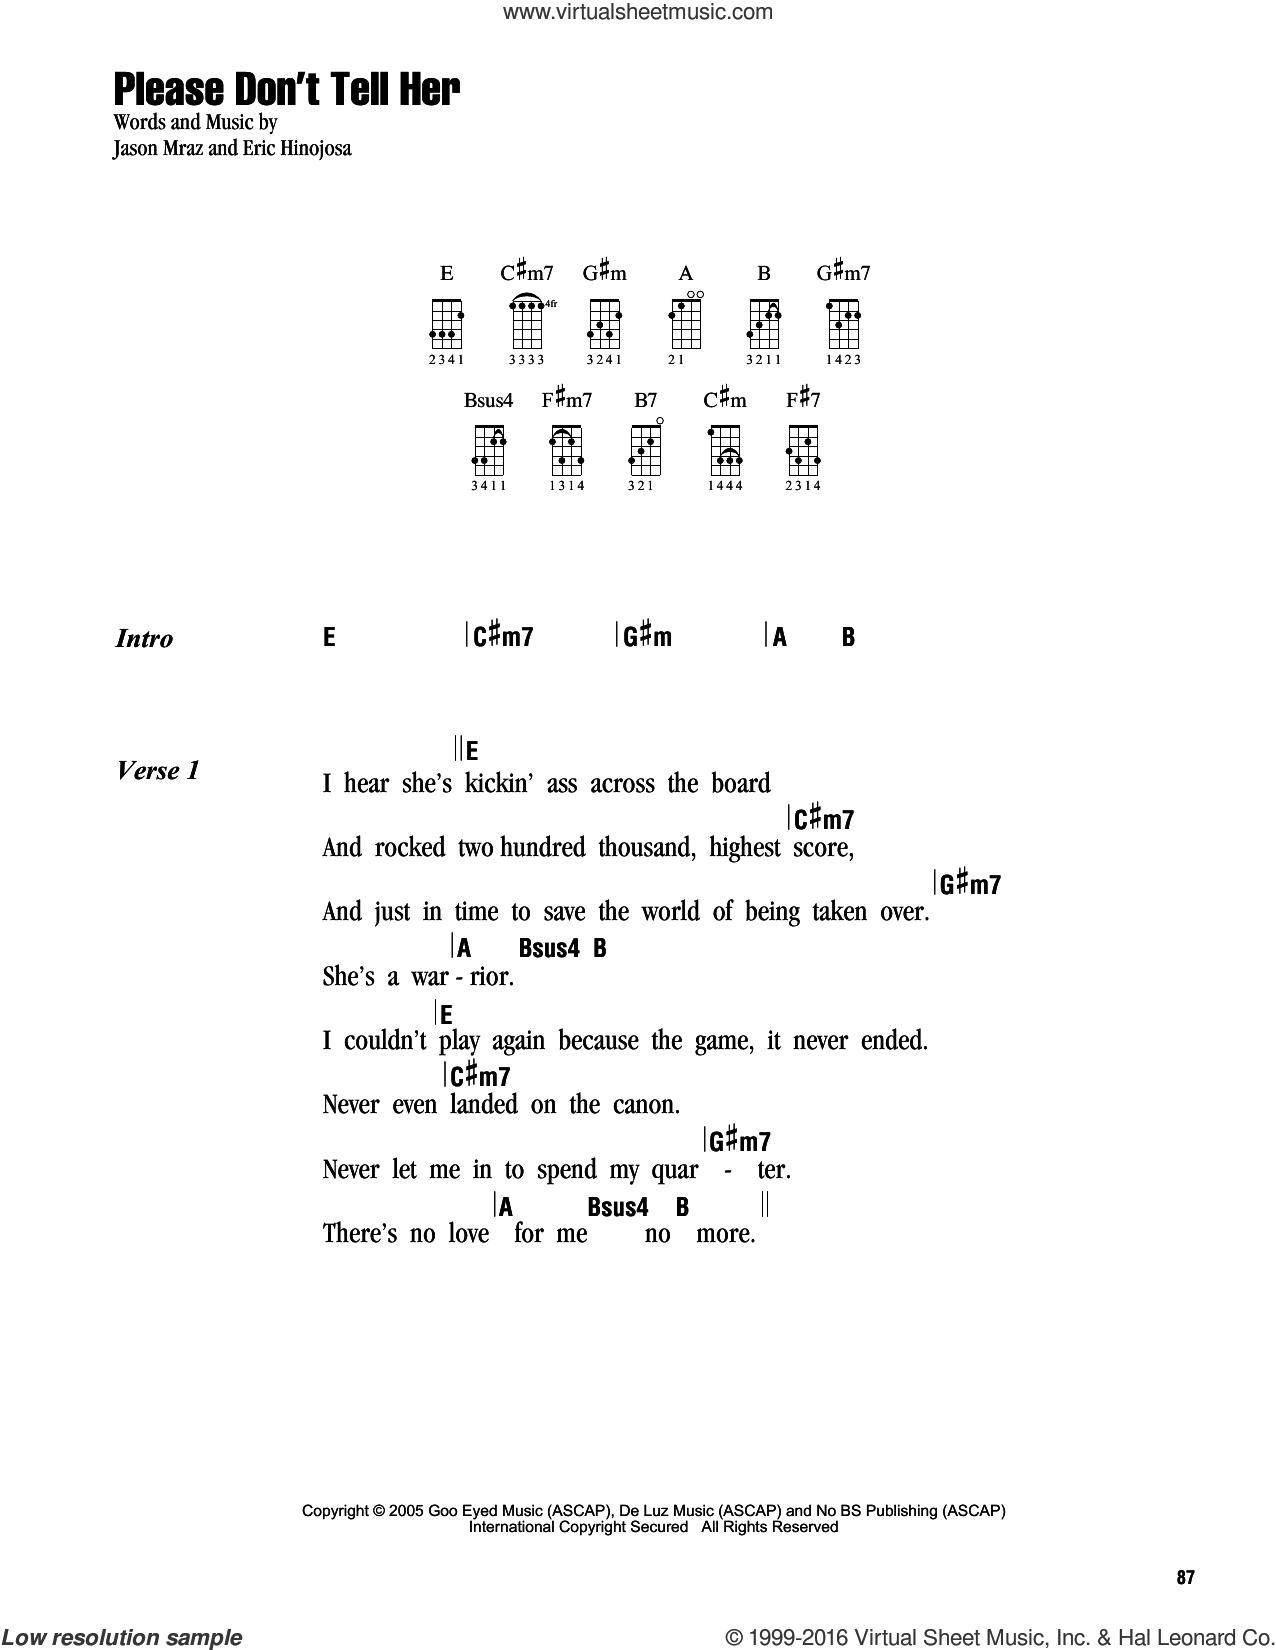 Please Don't Tell Her sheet music for ukulele (chords) by Jason Mraz and Eric Hinojosa, intermediate skill level